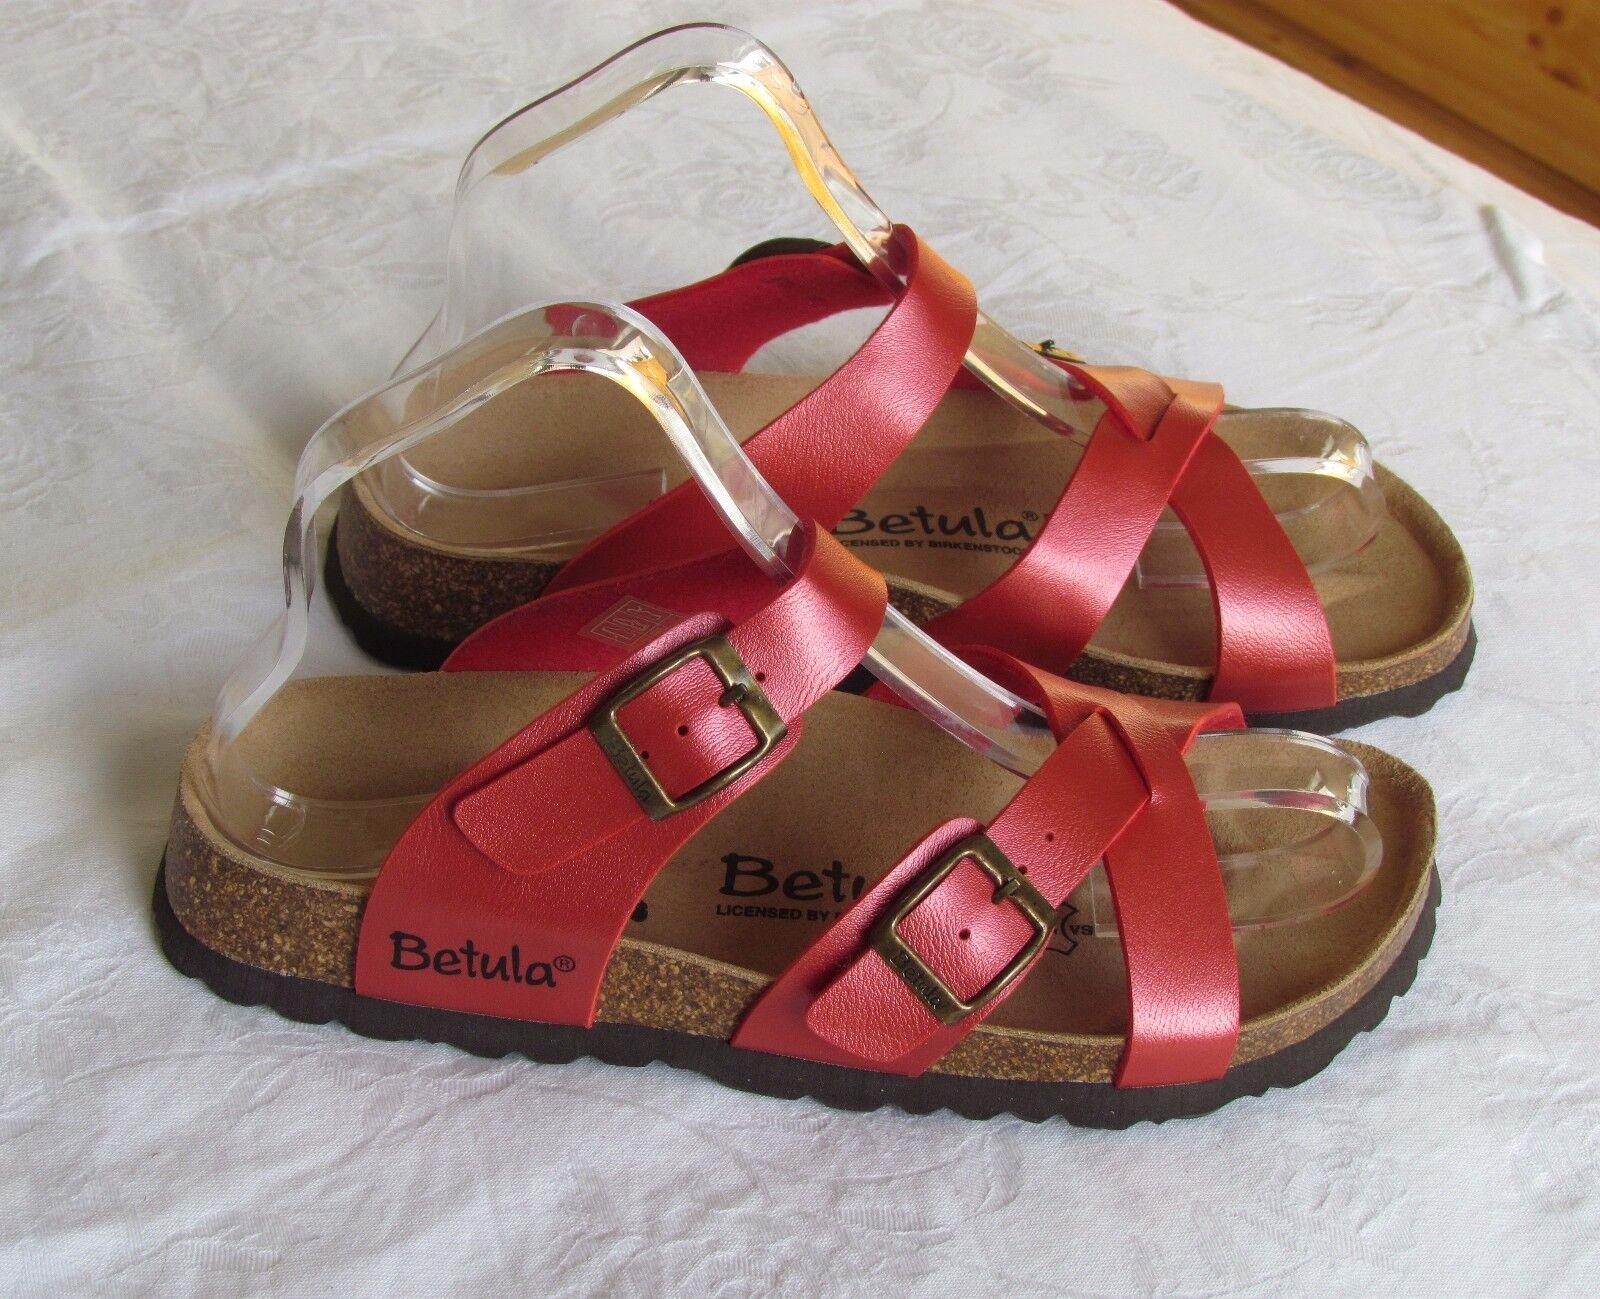 Nuevas damas Betula By Birkenstock Rojo Brillo Mulas Sandalias UK Size 4.5